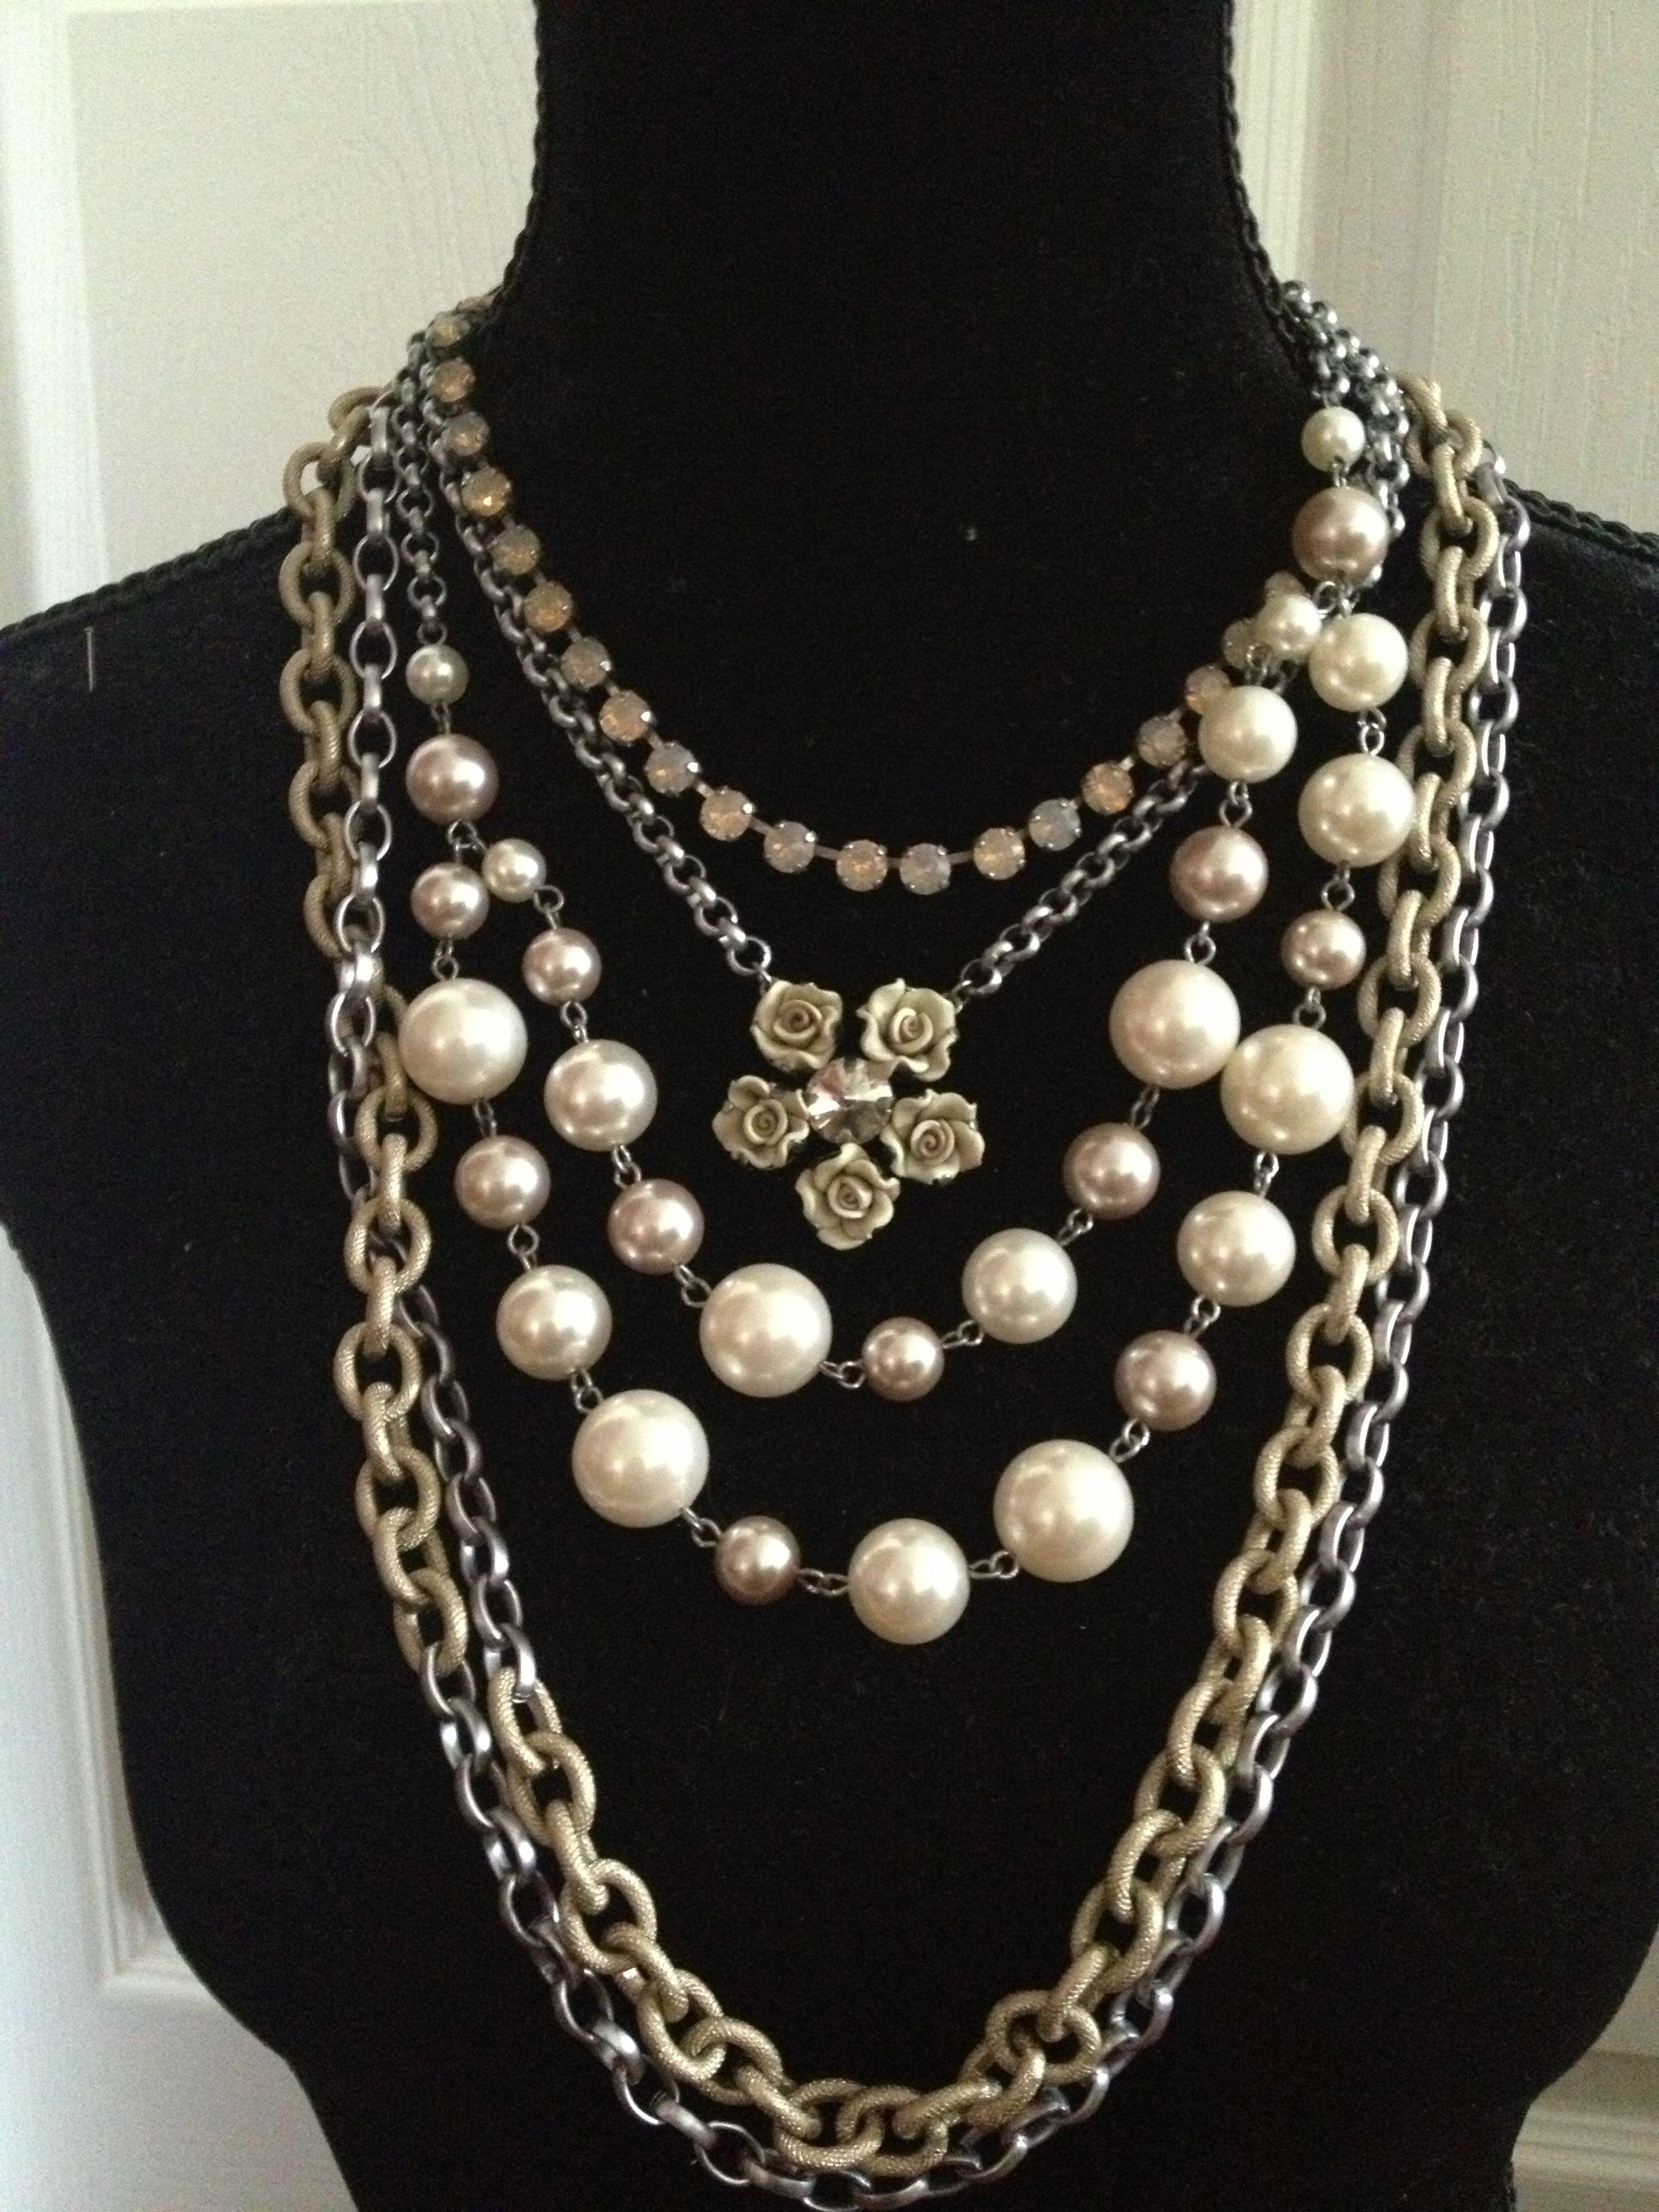 Sabika mix and match. W13 Print Ideas London choker and Rose necklace, Raw elegance Pearl choker S13 Kimono extra long necklace